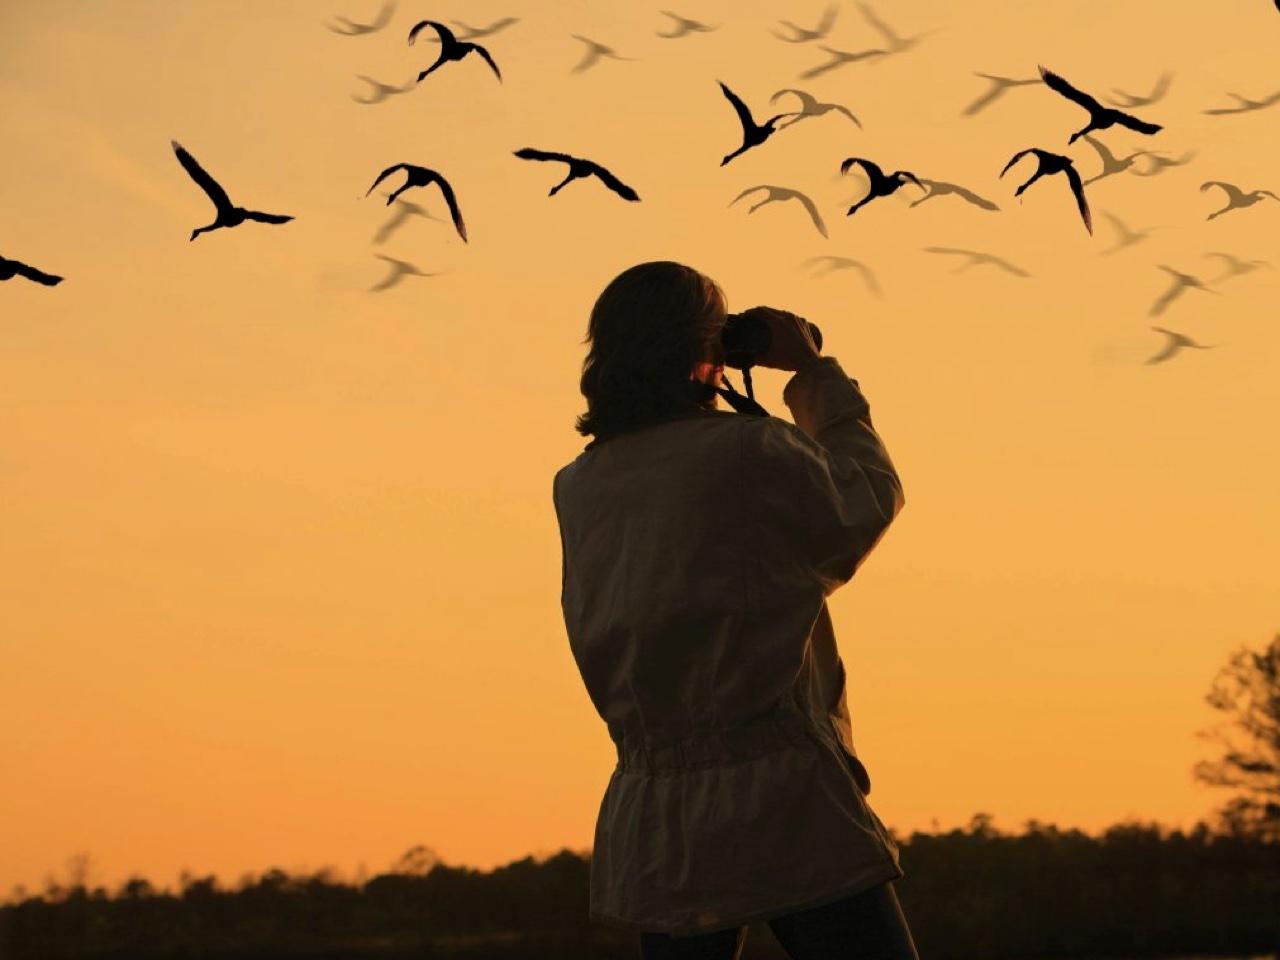 Bird watching holidays crete, bird wathcing chania crete, bird wathcing heraklion crete, bird wathcing rethymno crete, bird wathcing lasithi crete, bird wathcing lake kournas crete, bird wathcing georgioupolis crete, moni preveli birdwatching, faneromeni lake